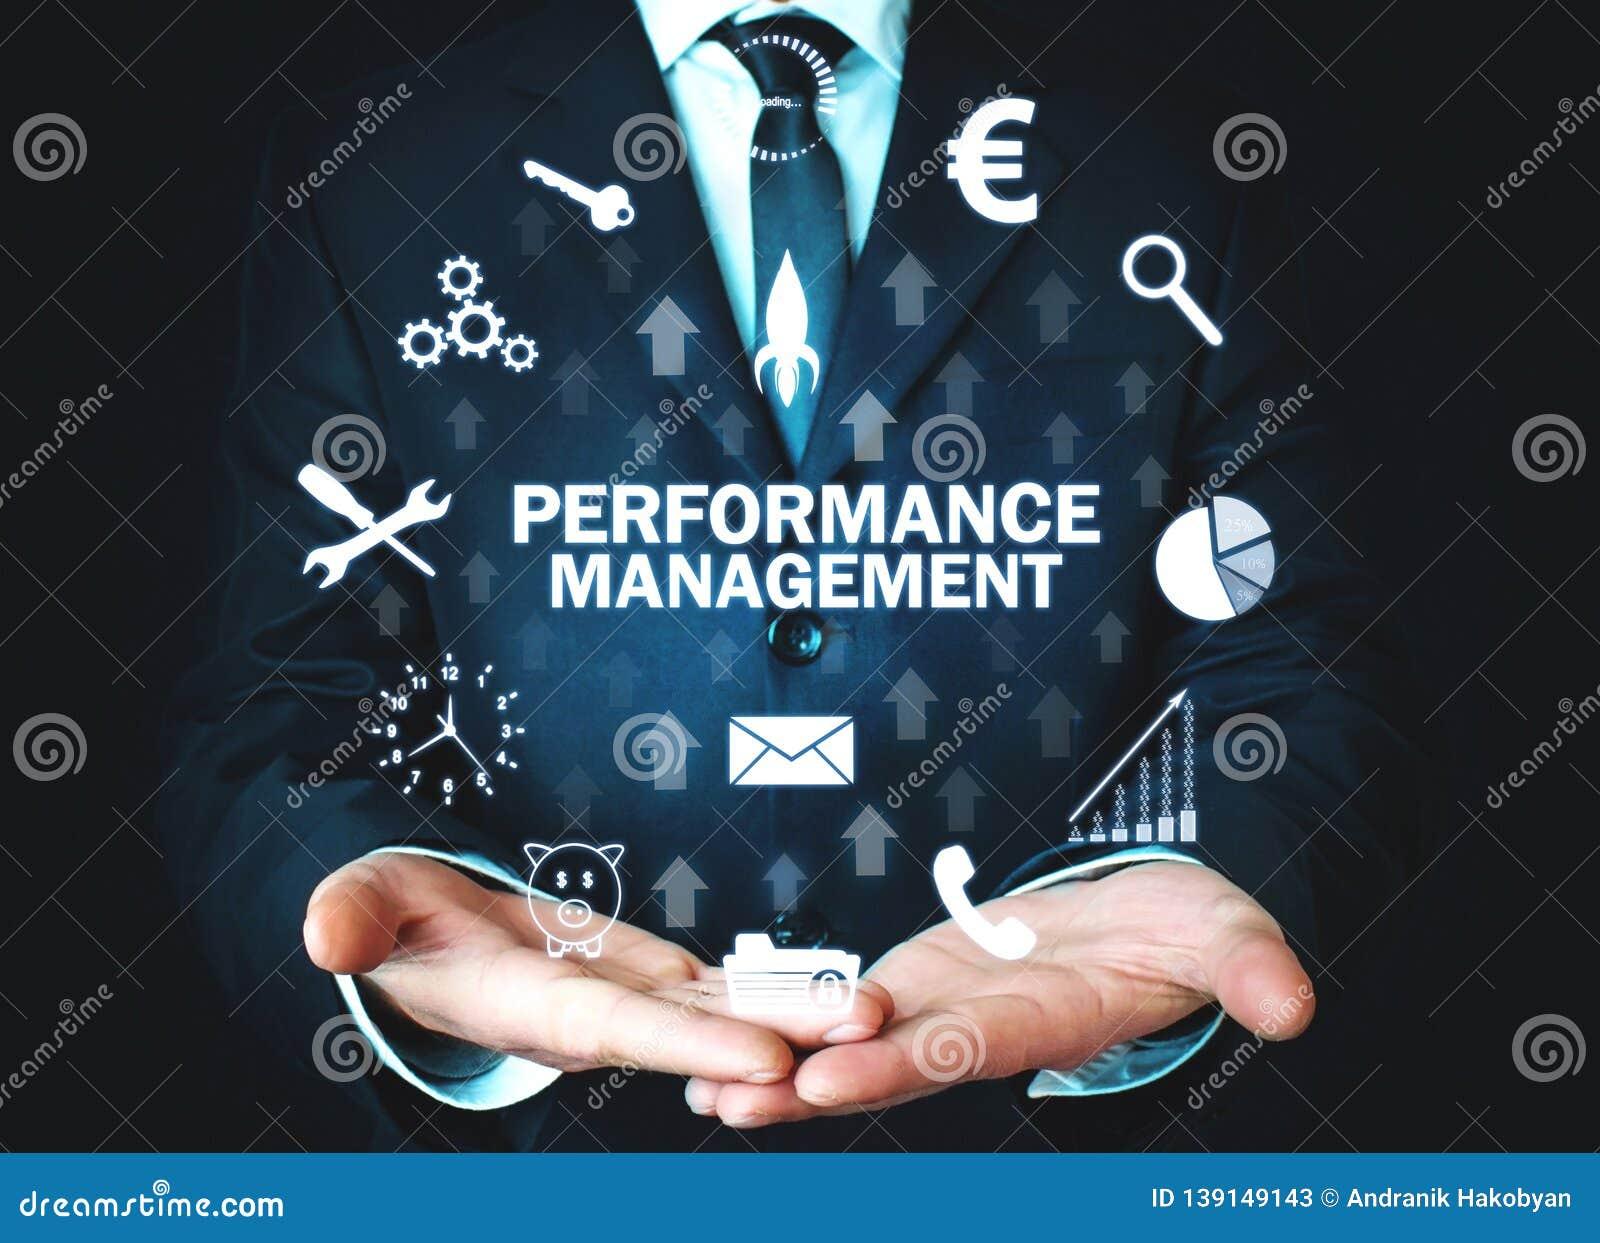 Performance Management. Business technology concept